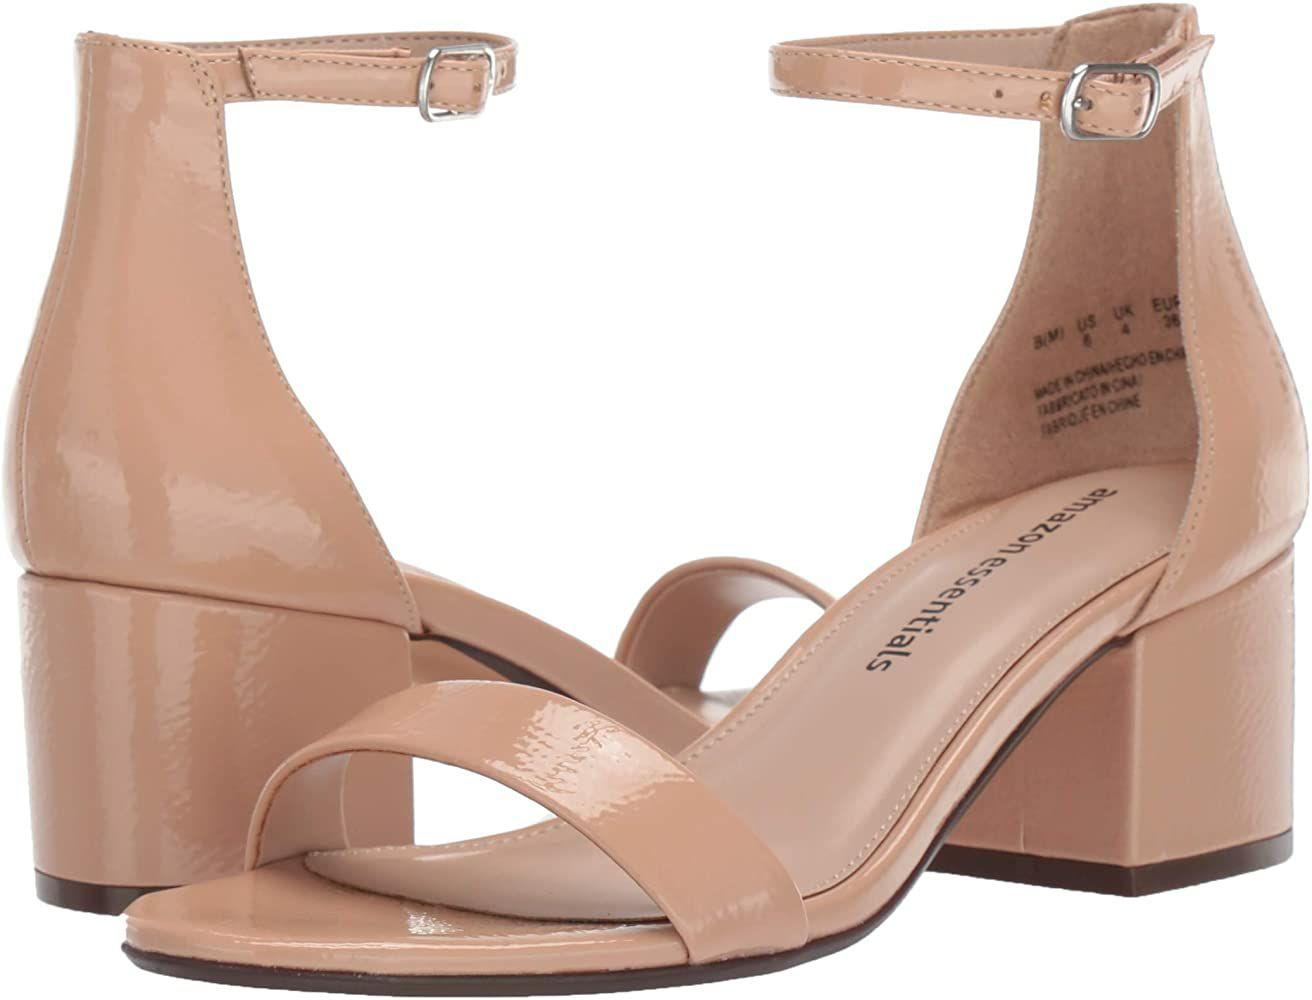 TALLA 39 - Amazon Essentials NOLA - Heeled-Sandals Mujer